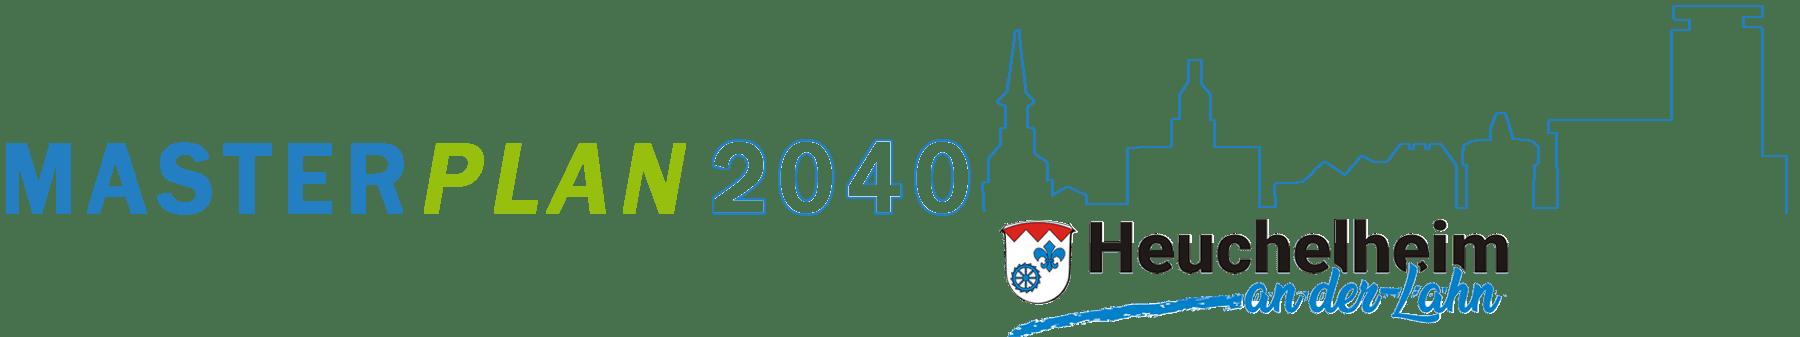 Logo - Masterplan Heuchelheim 2040-Malaktion